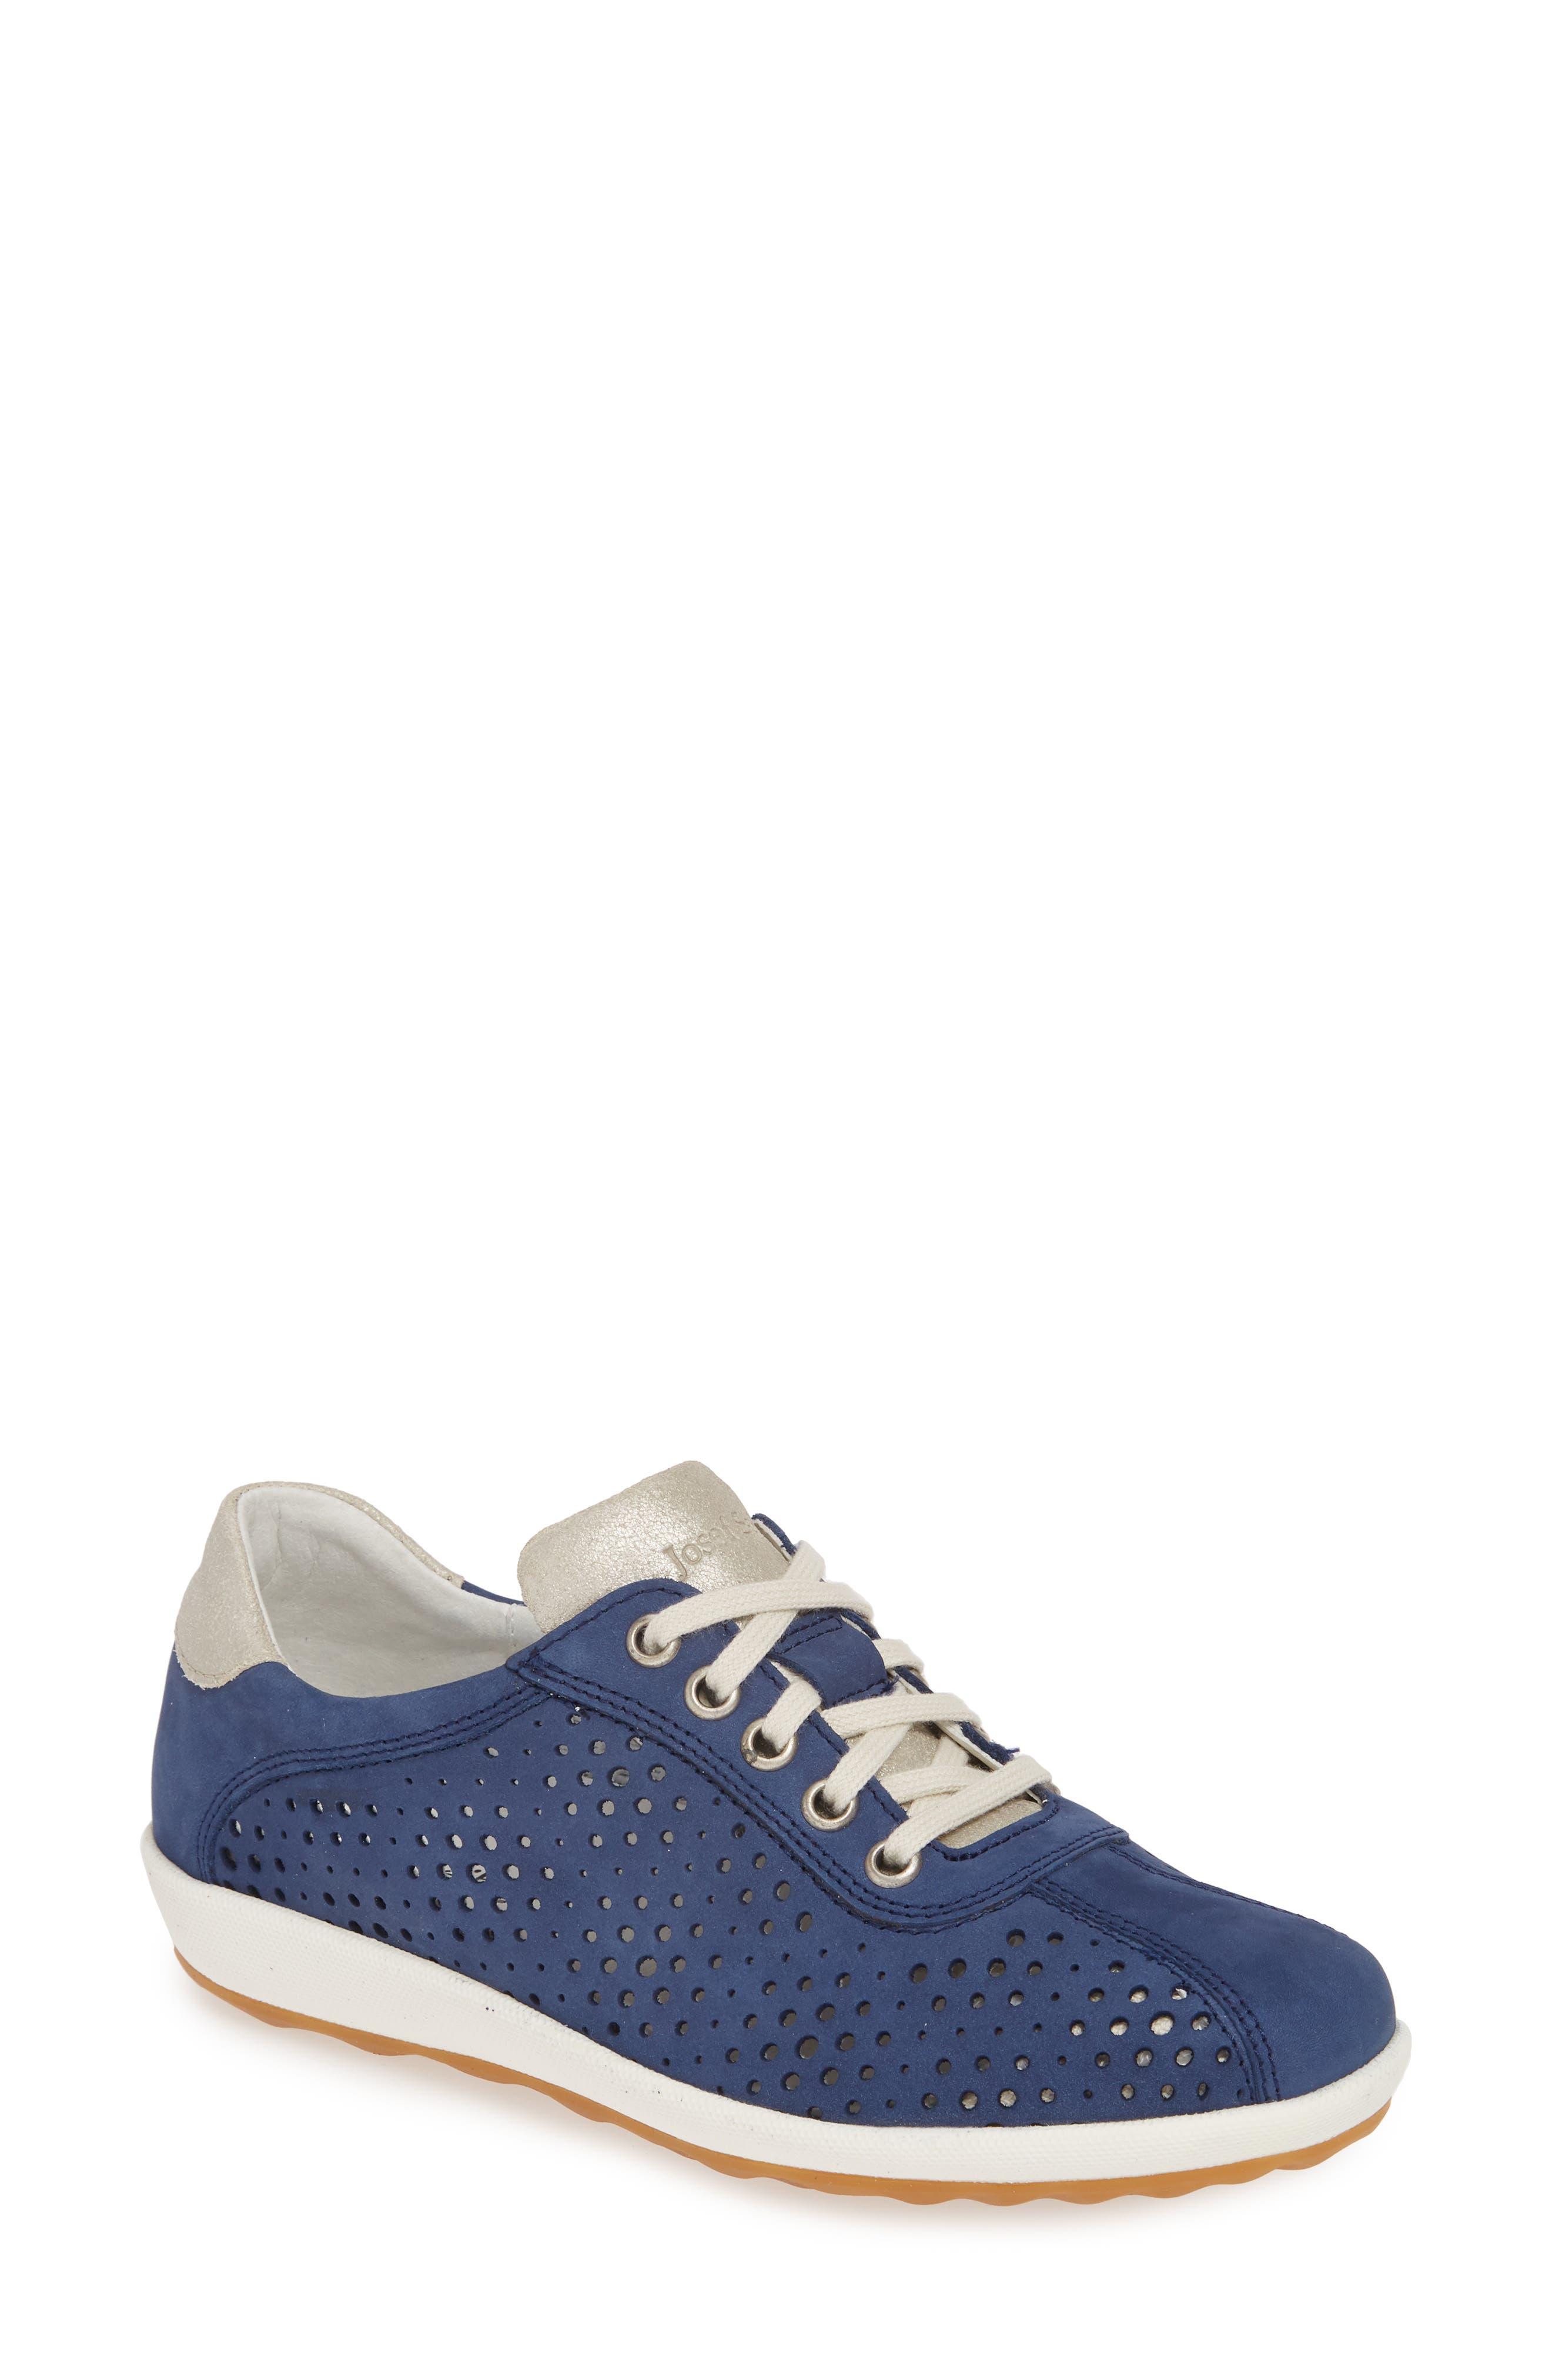 Josef Seibel Viola 09 Sneaker, Blue